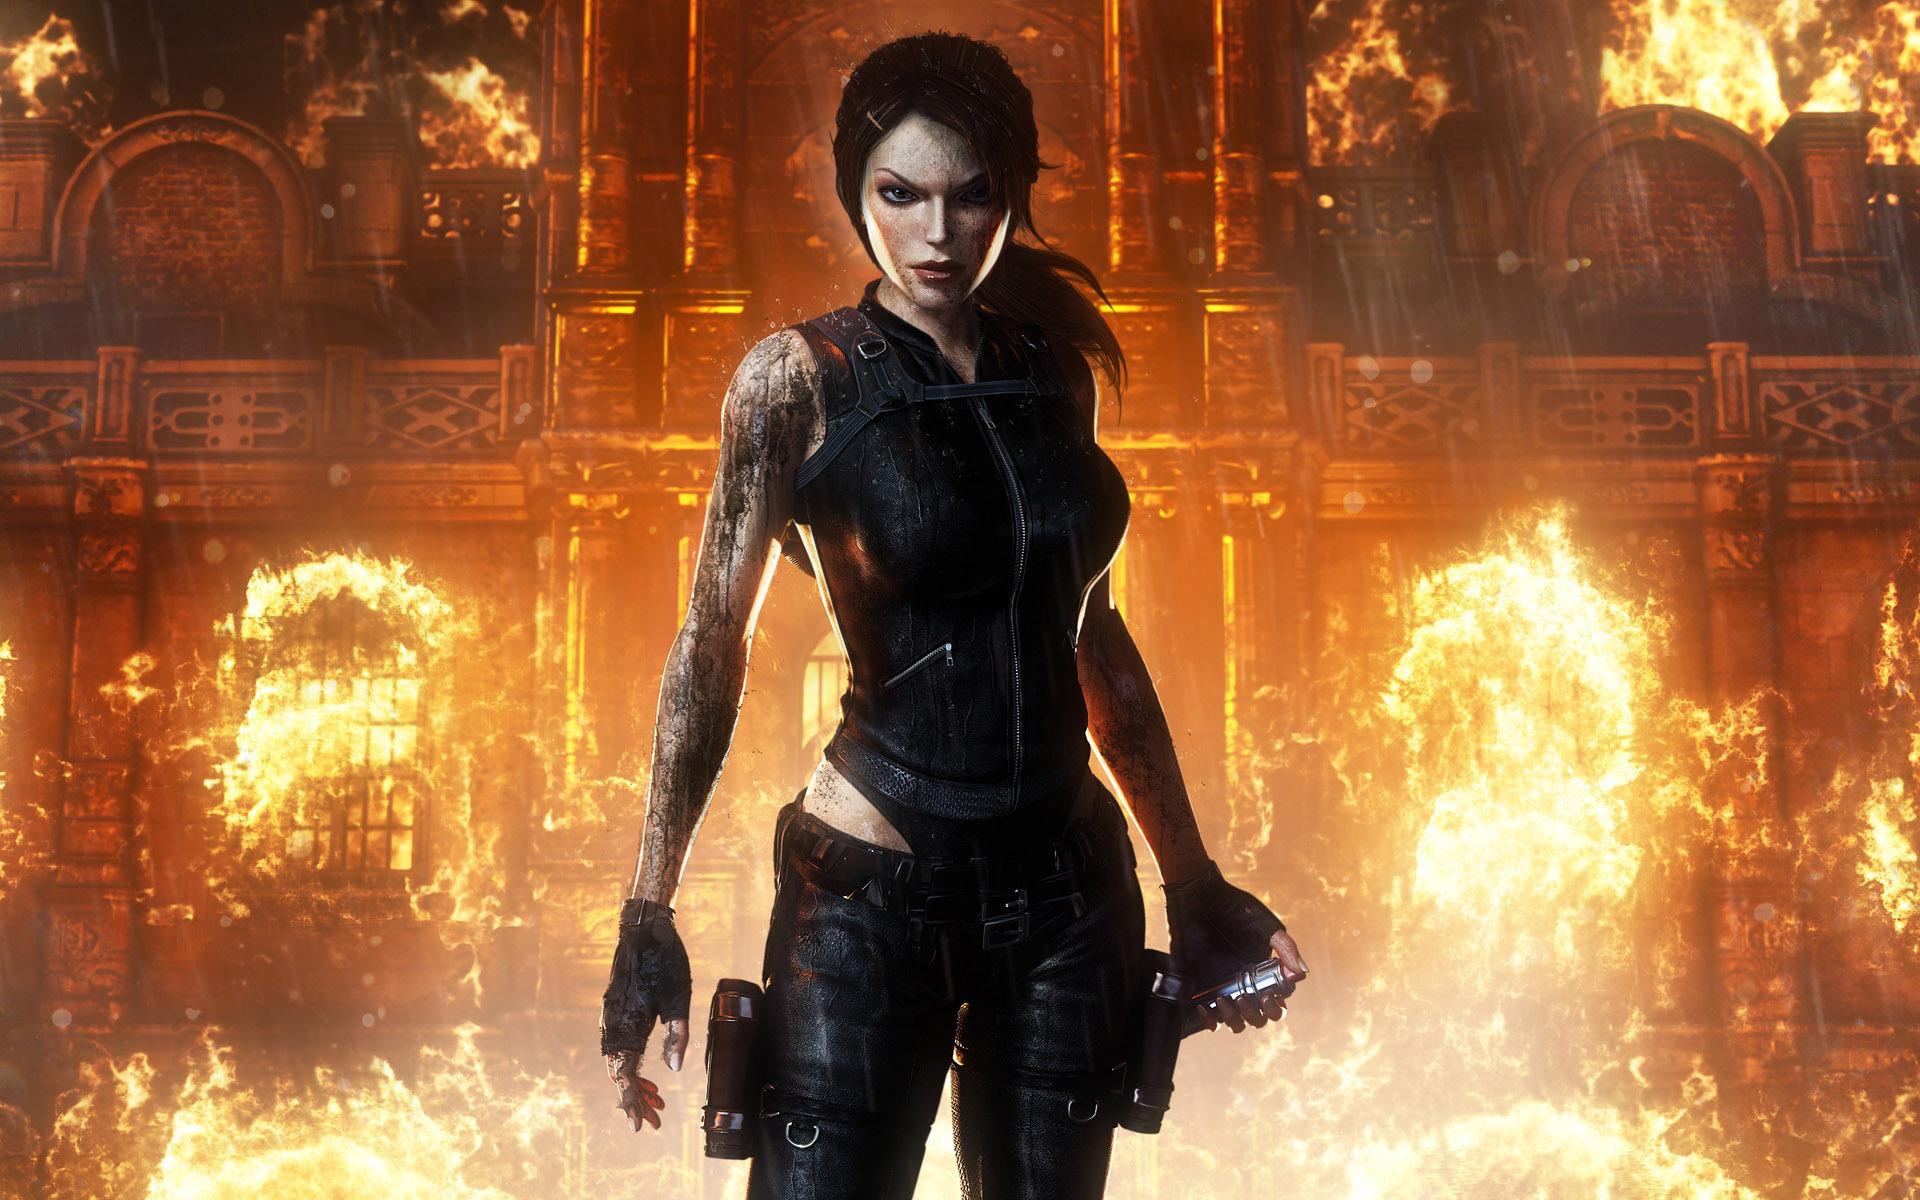 Women, Anime, Video Games, Tomb Raider, Lara Croft - Tomb Raider Underworld 4k , HD Wallpaper & Backgrounds